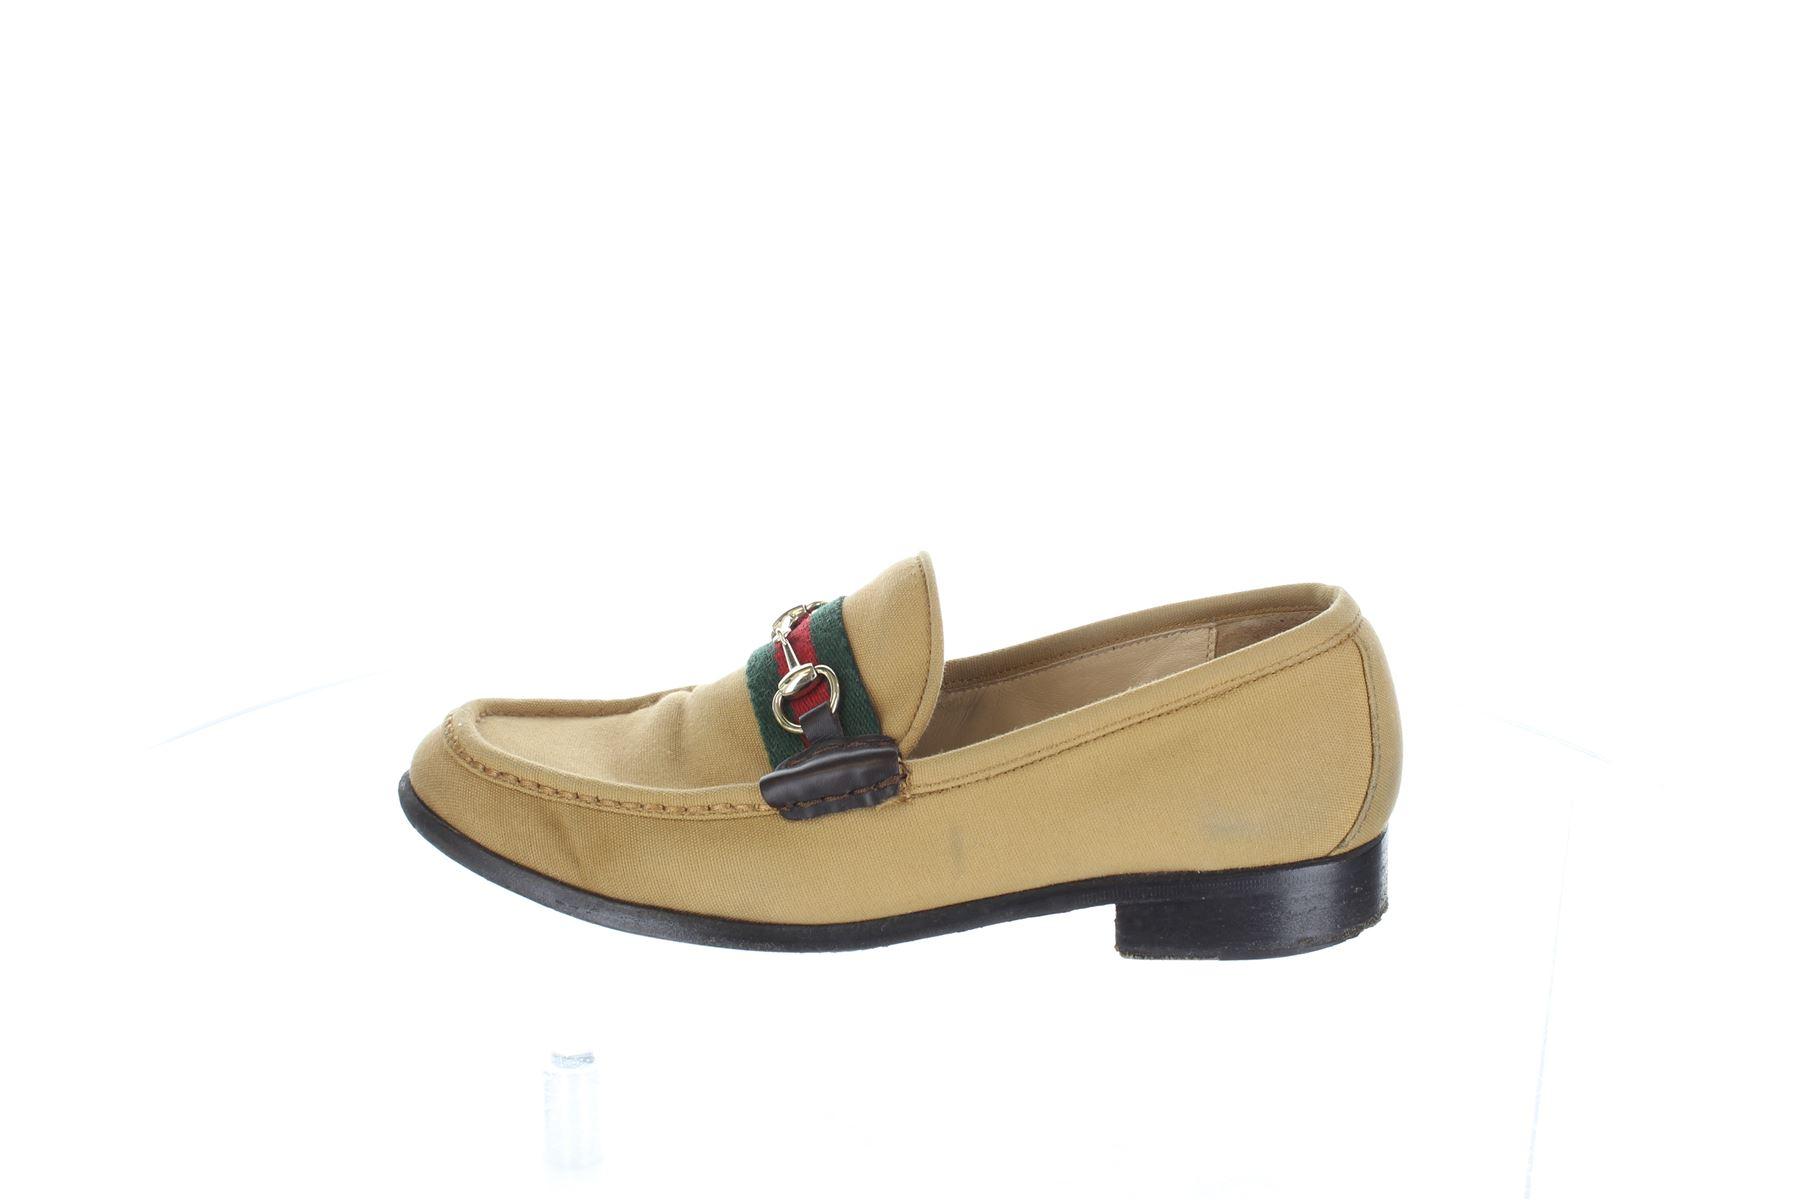 6b9ac263abf GUCCI Beige Cloth Loafers